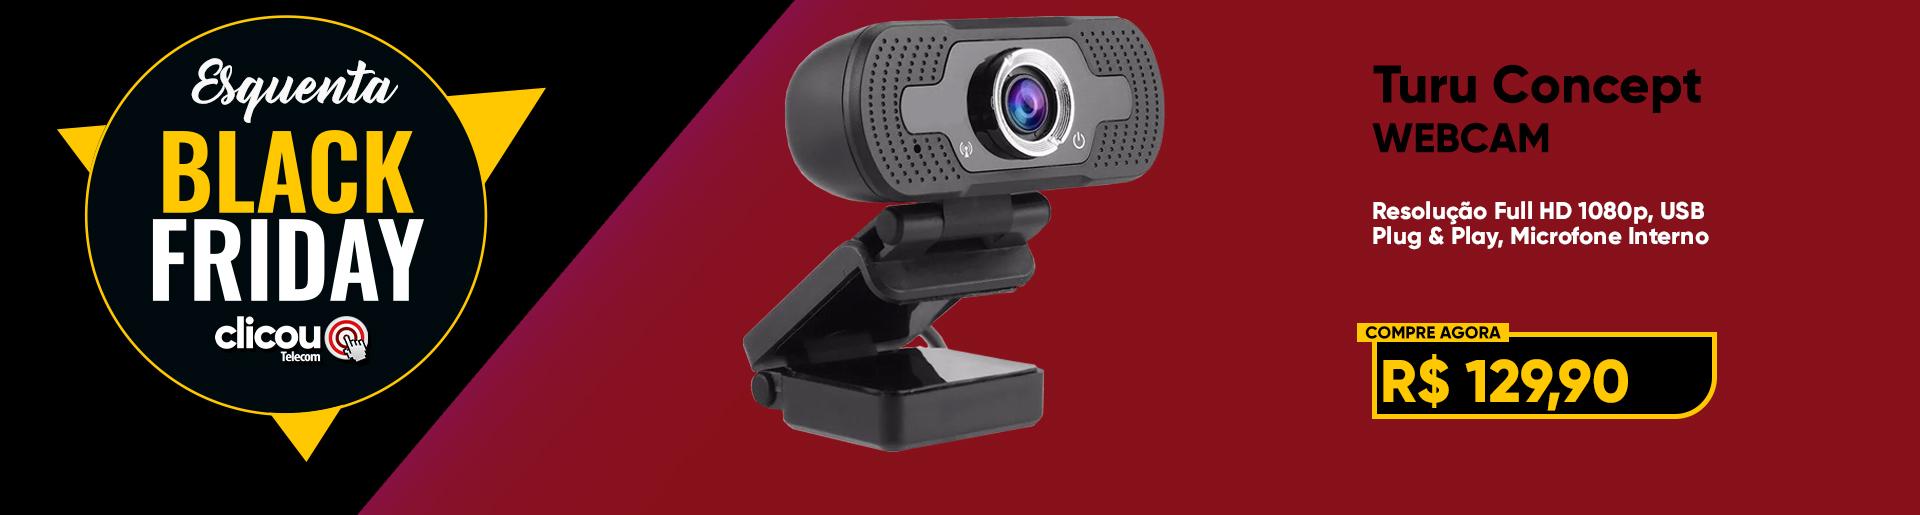 Webcam Turu Concept